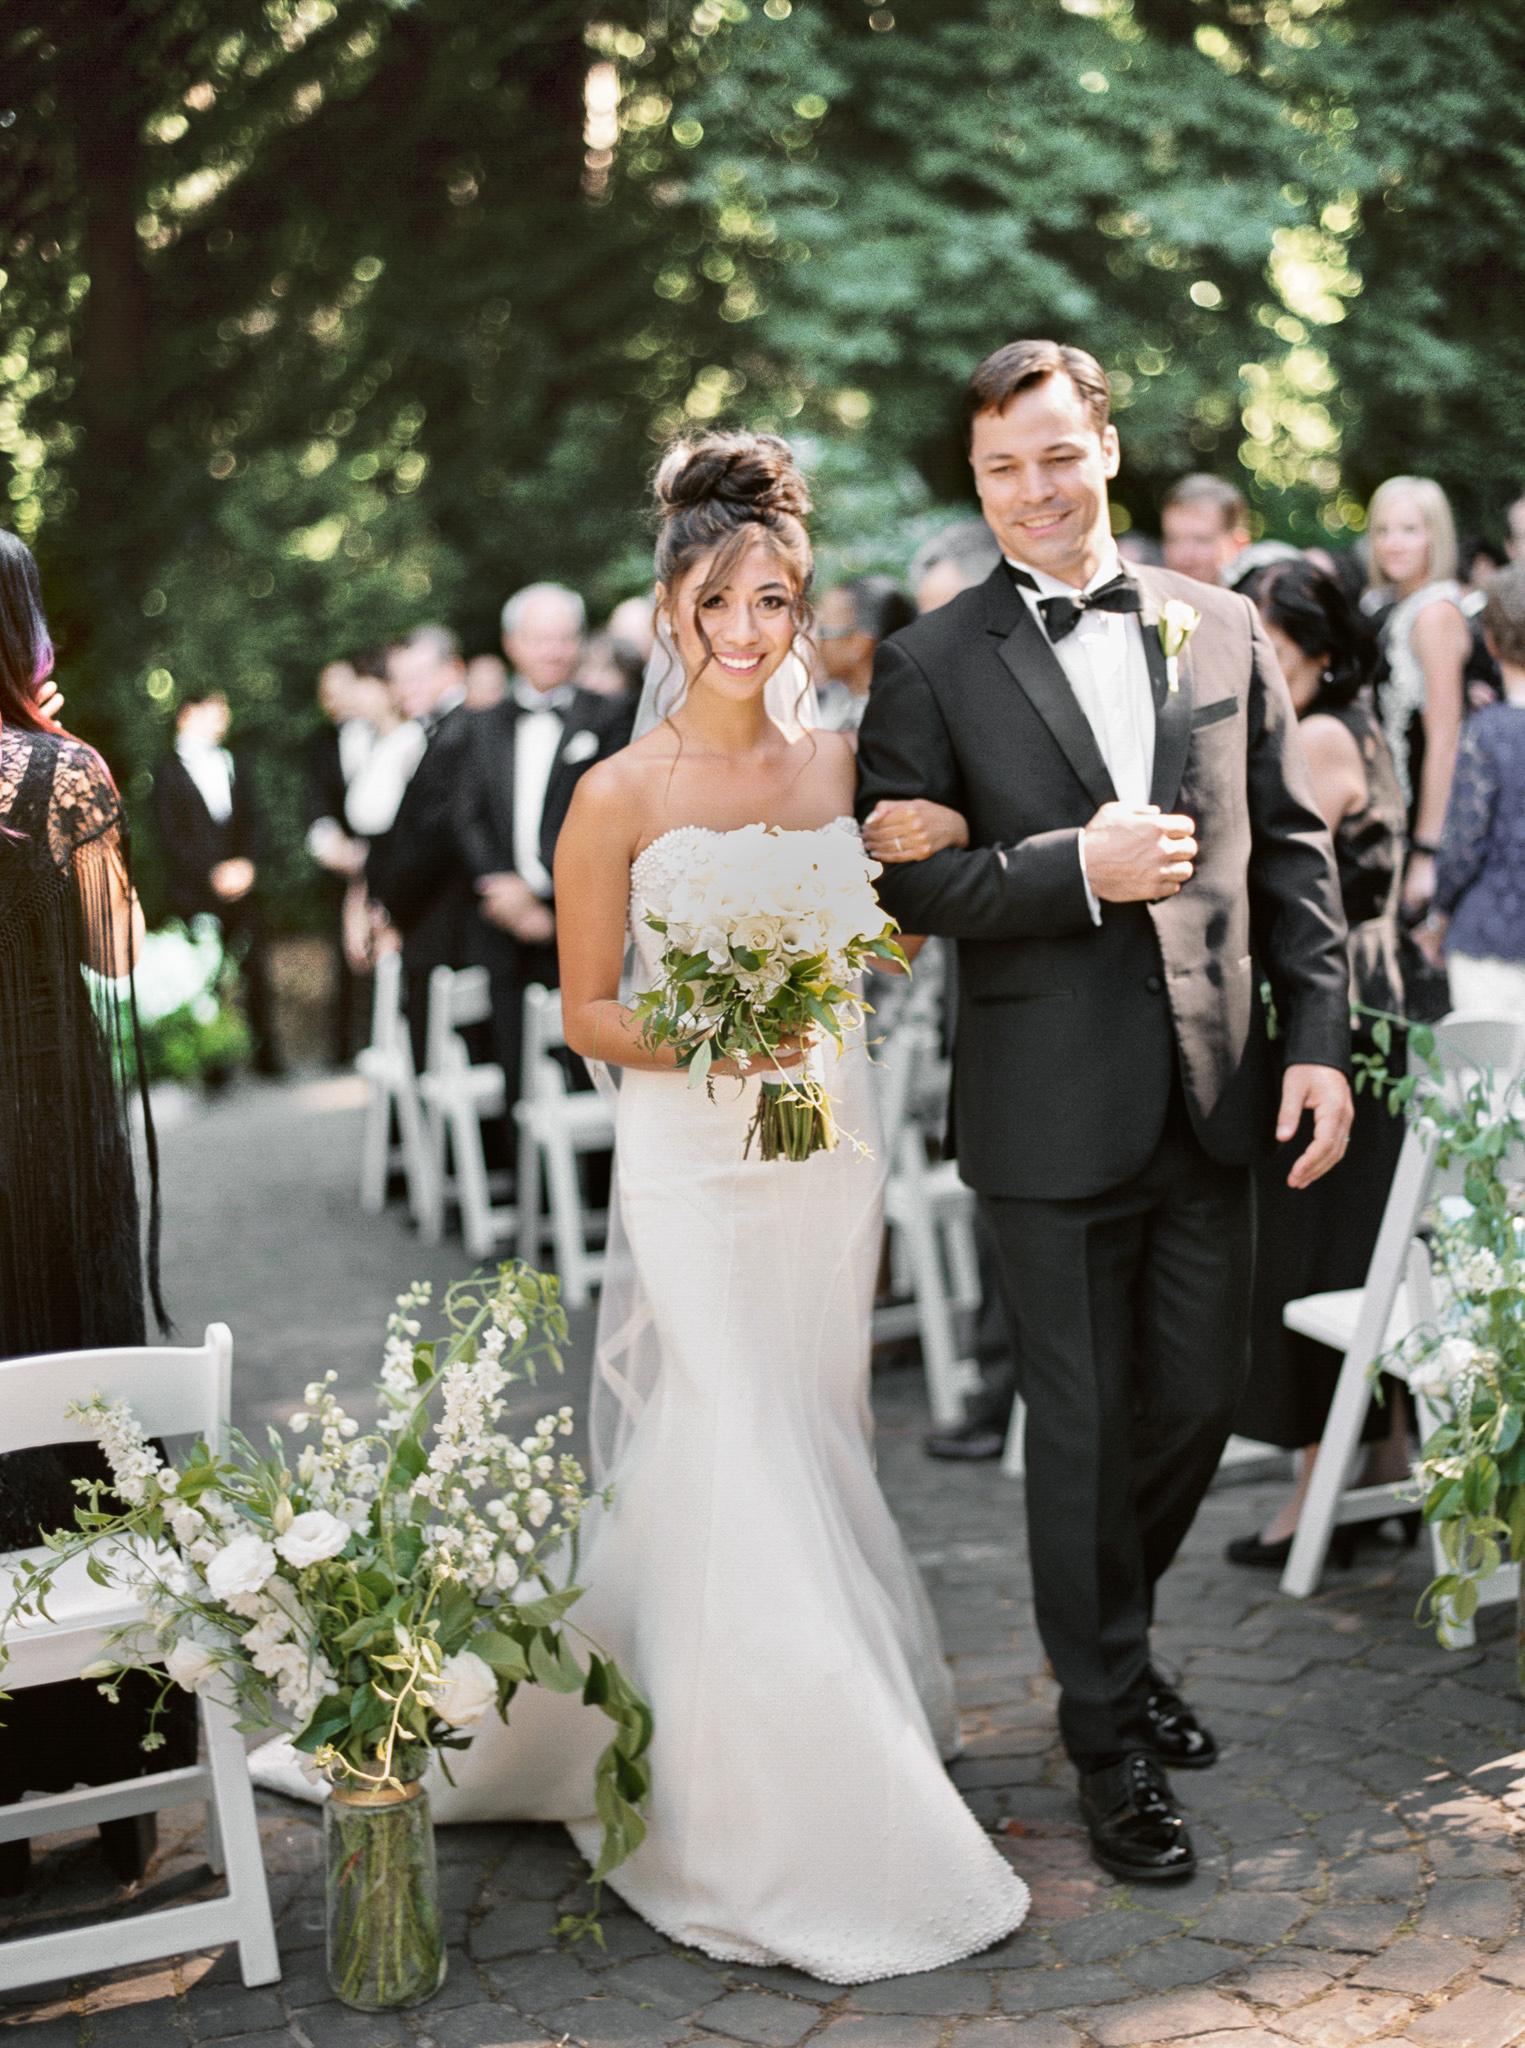 145OutliveCreative_Travel_Photographer_Videographer_Lewis&Clark_Oregon_Elegant_BlackTie_Destination_Wedding.jpg